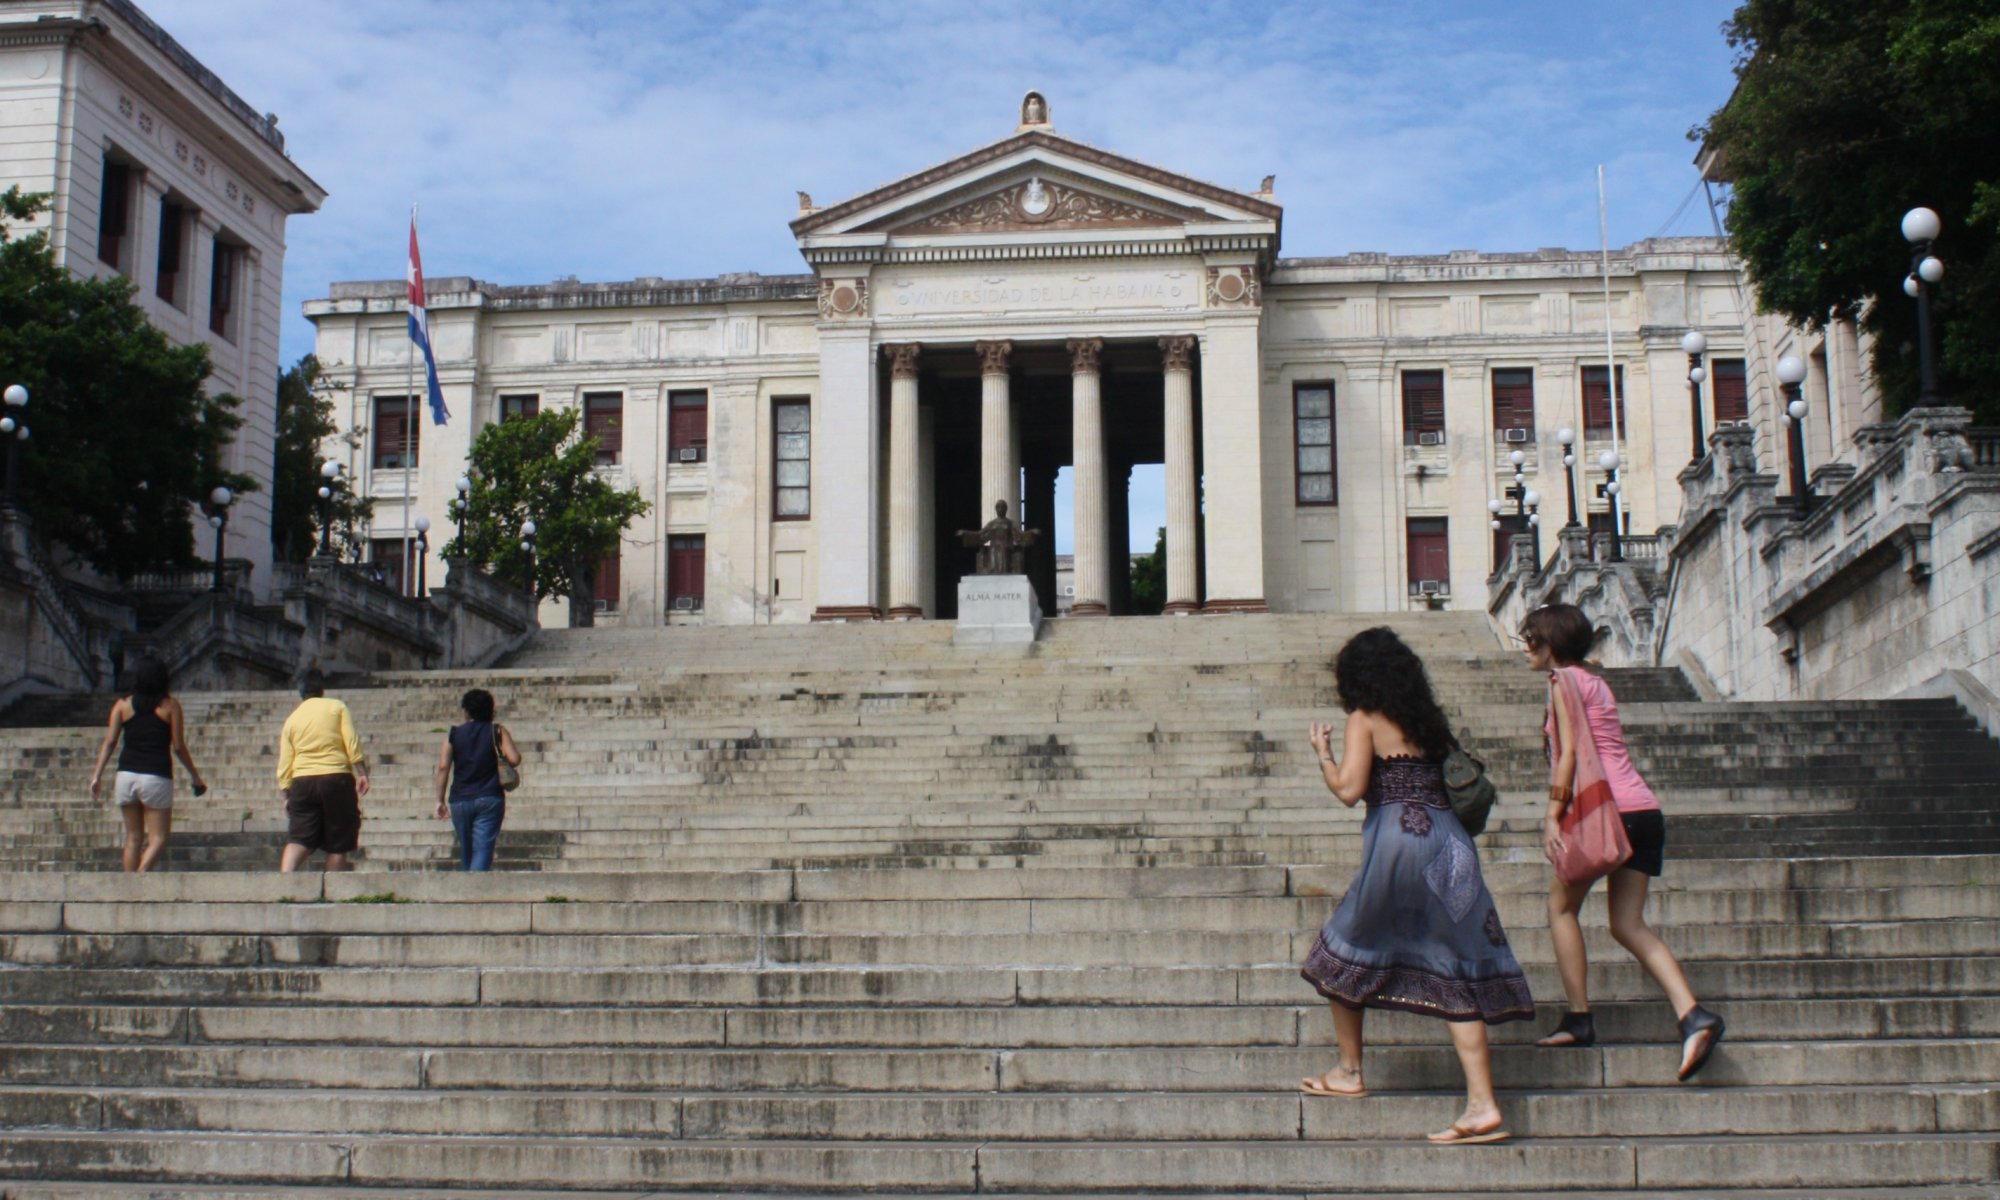 Universidad de La Habana, La Habana, Cuba